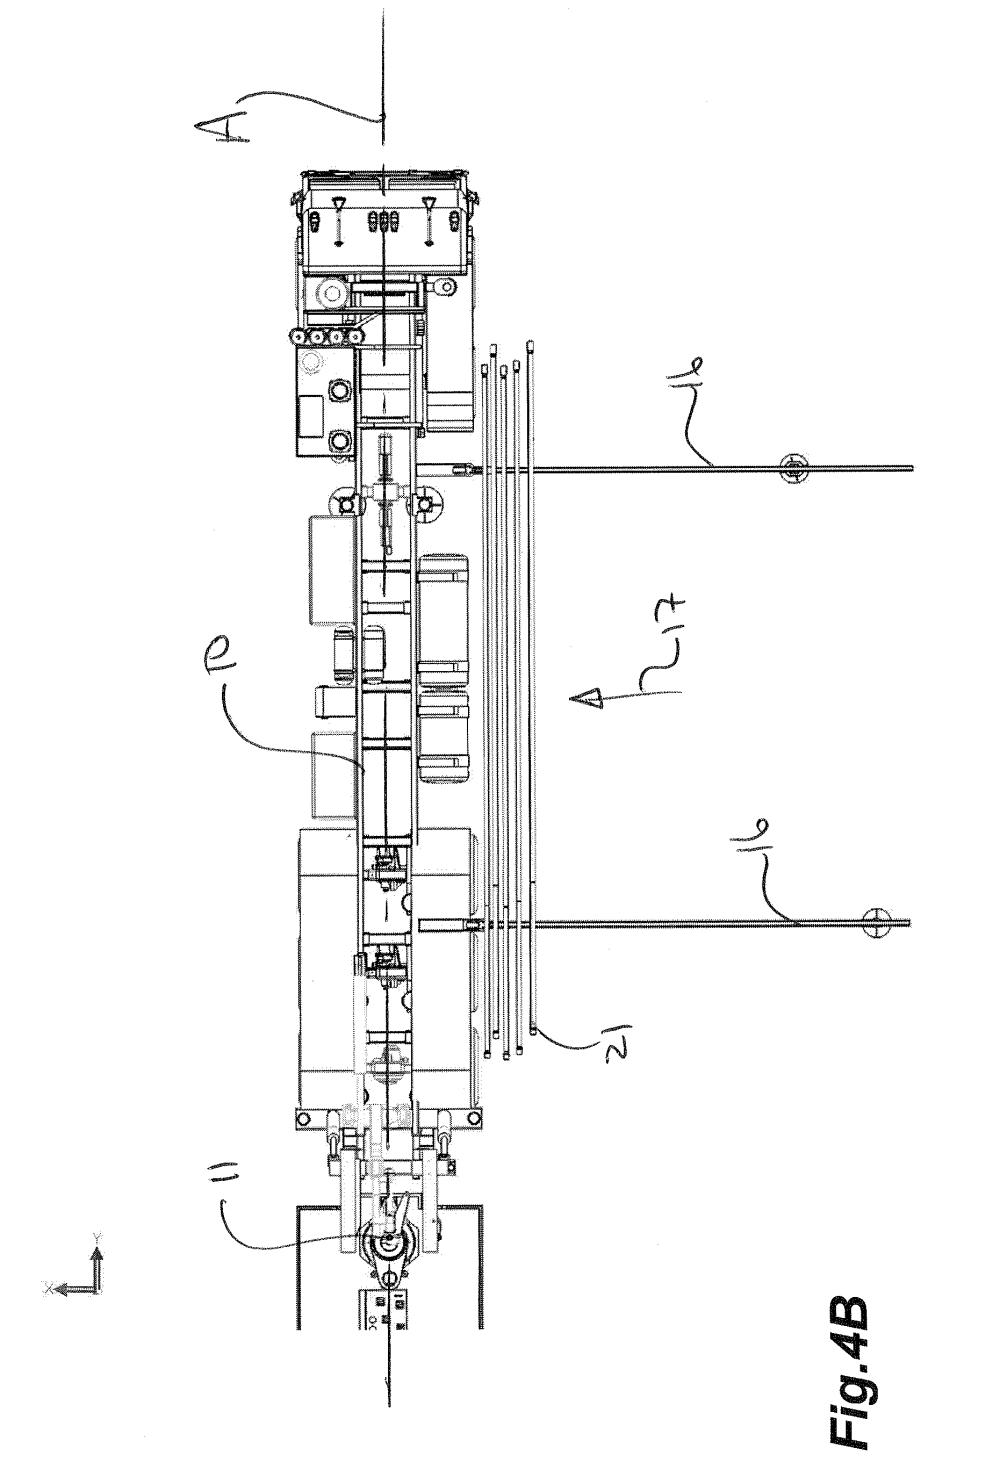 medium resolution of brevet us20100085677 motor control center communication system source three phase dol starter wiring diagram solutions